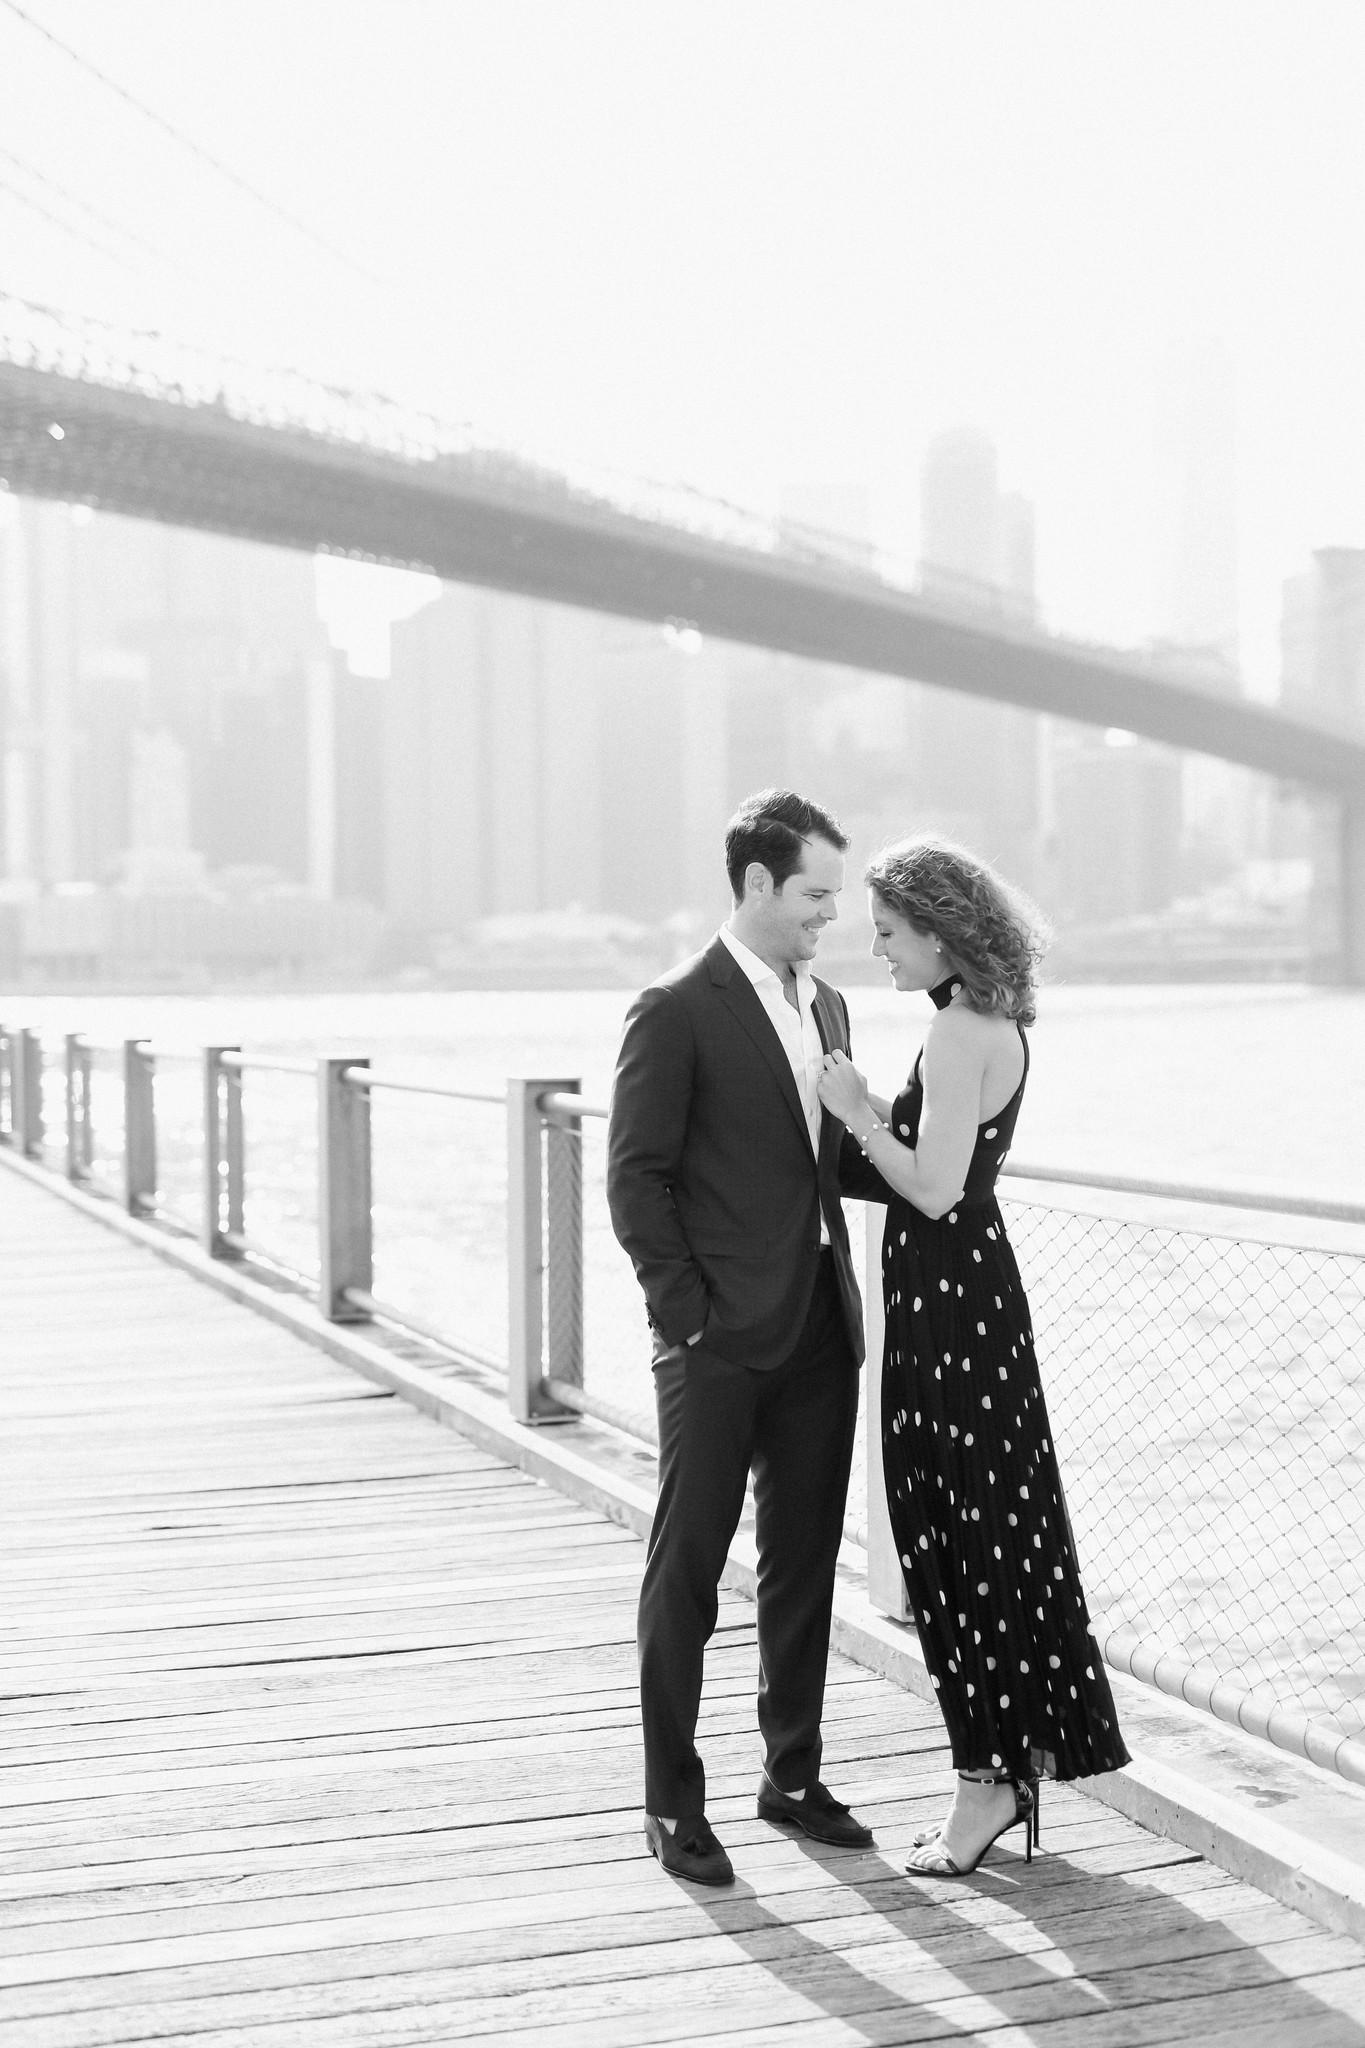 NY city hall wedding__ct wedding_ct wedding photographer-8.jpg